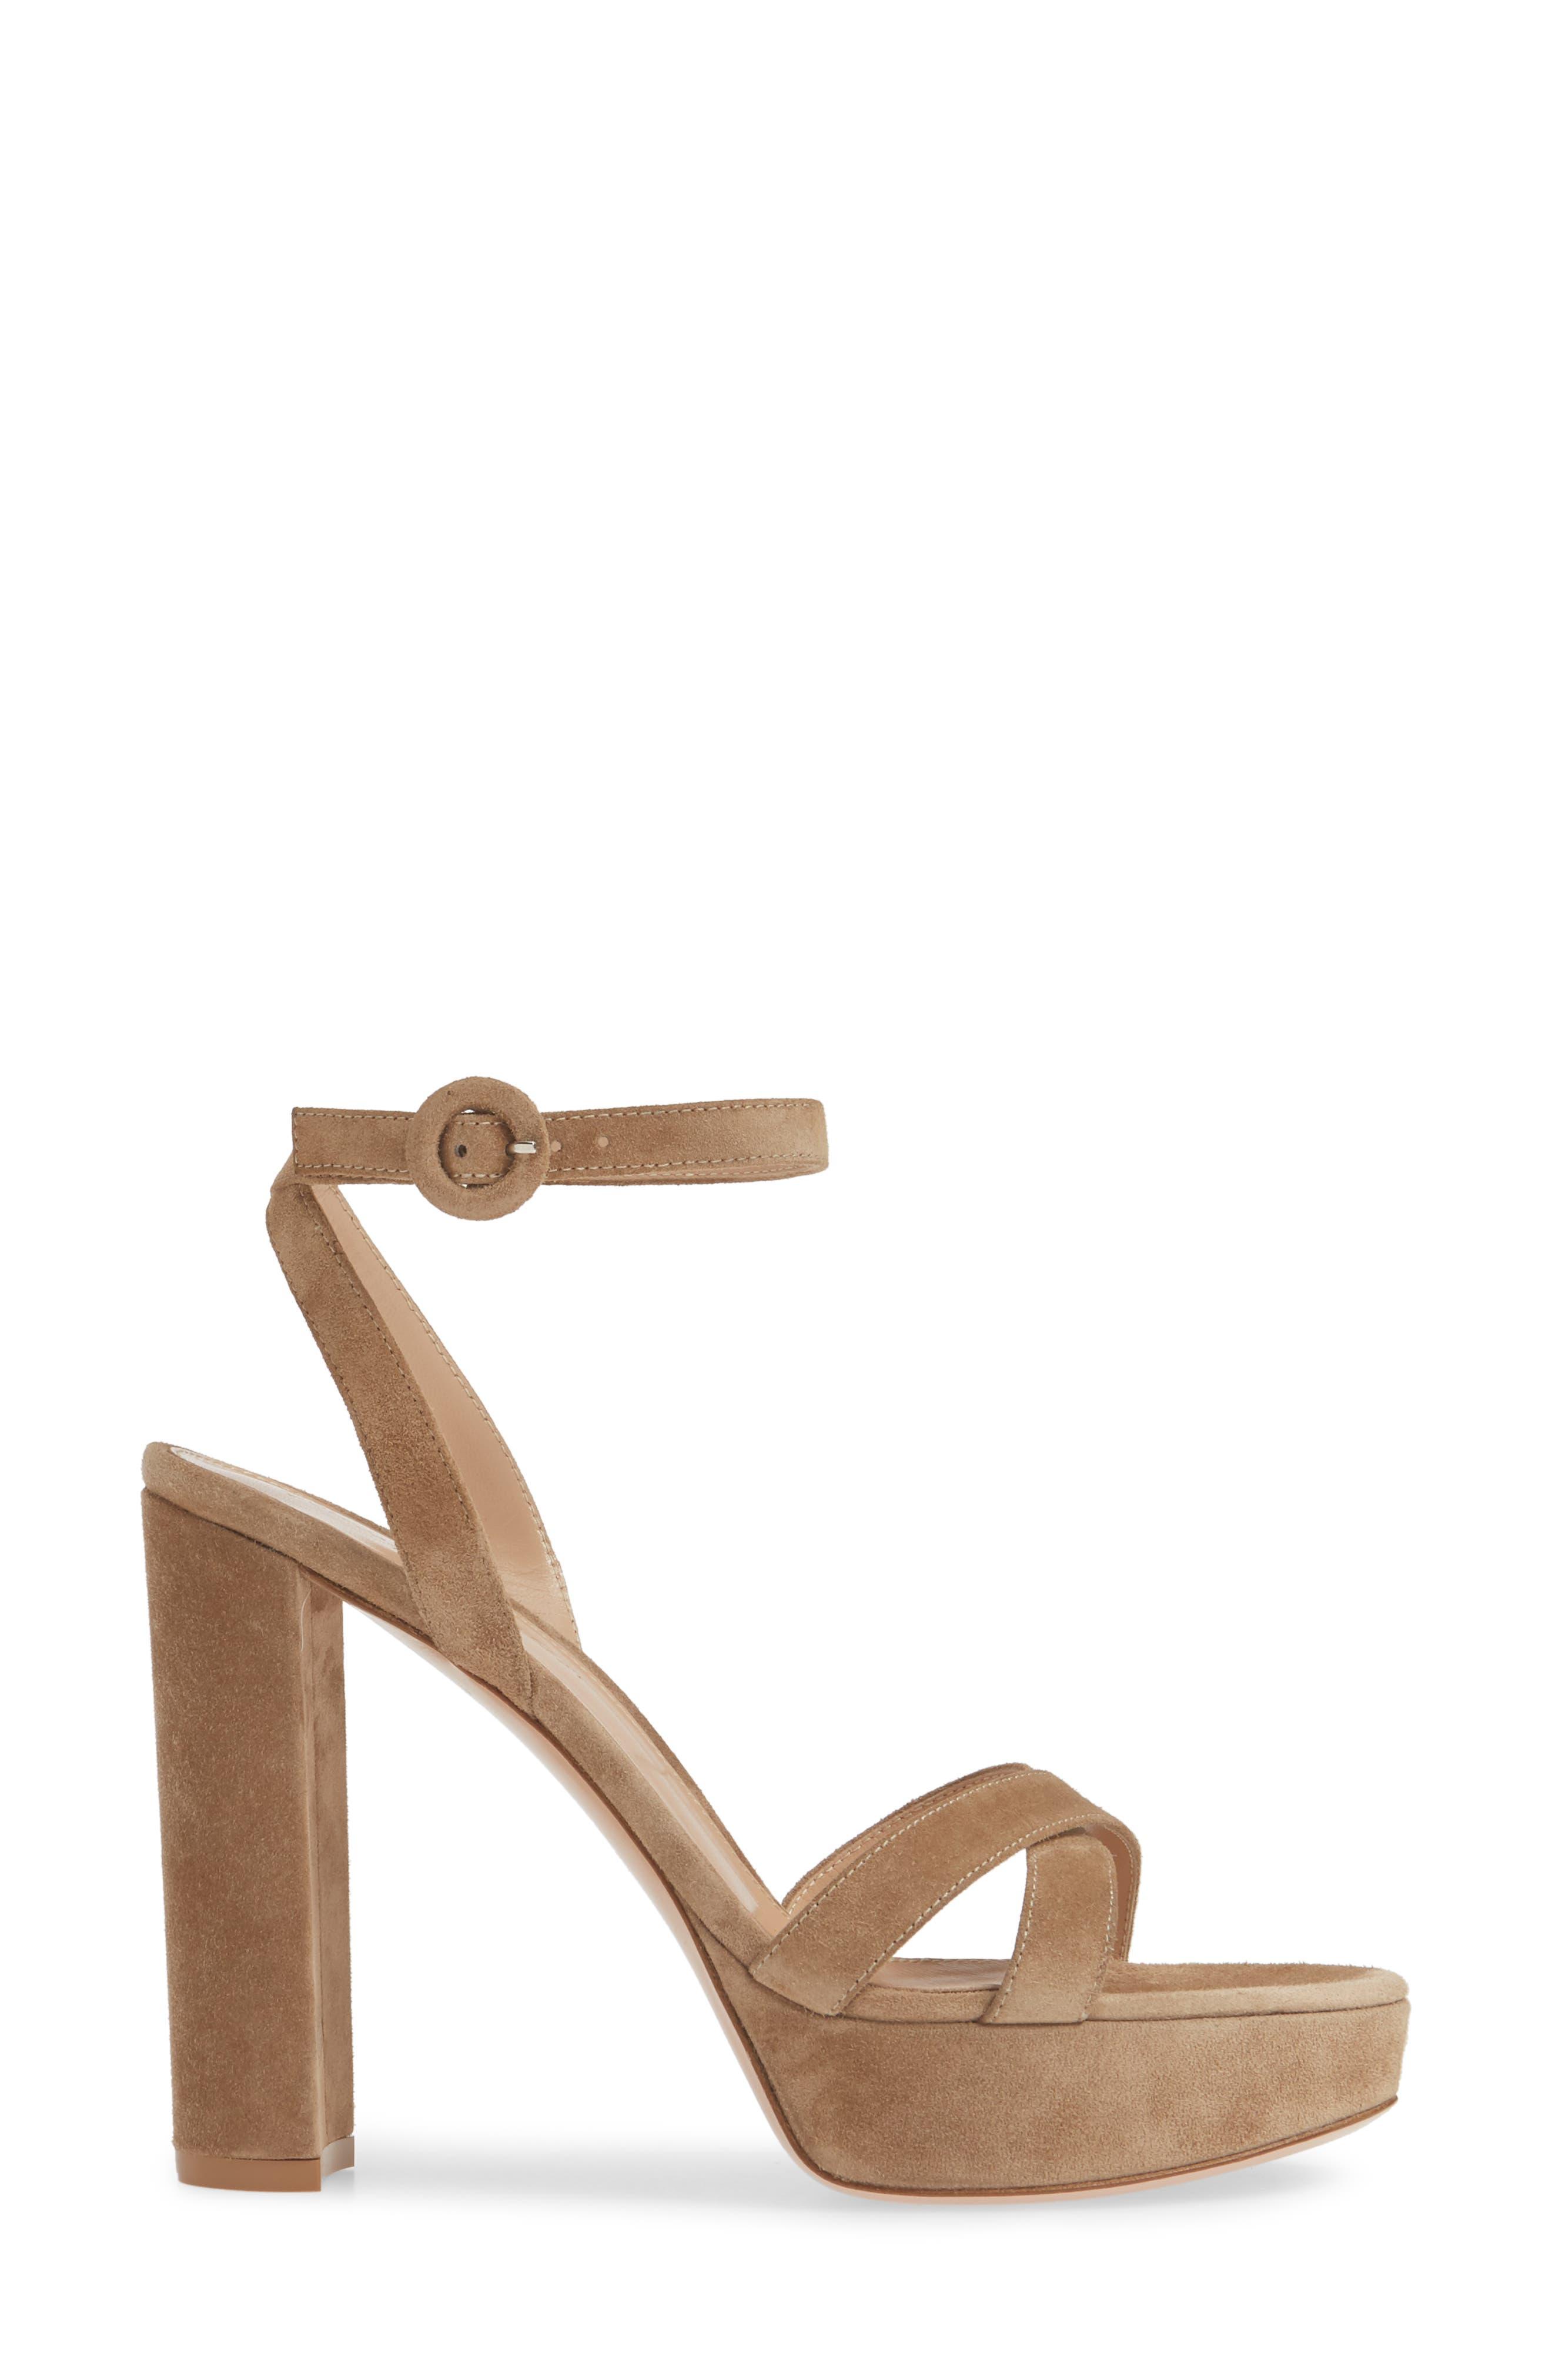 GIANVITO ROSSI, Ankle Strap Platform Sandal, Alternate thumbnail 3, color, CAMEL SUEDE